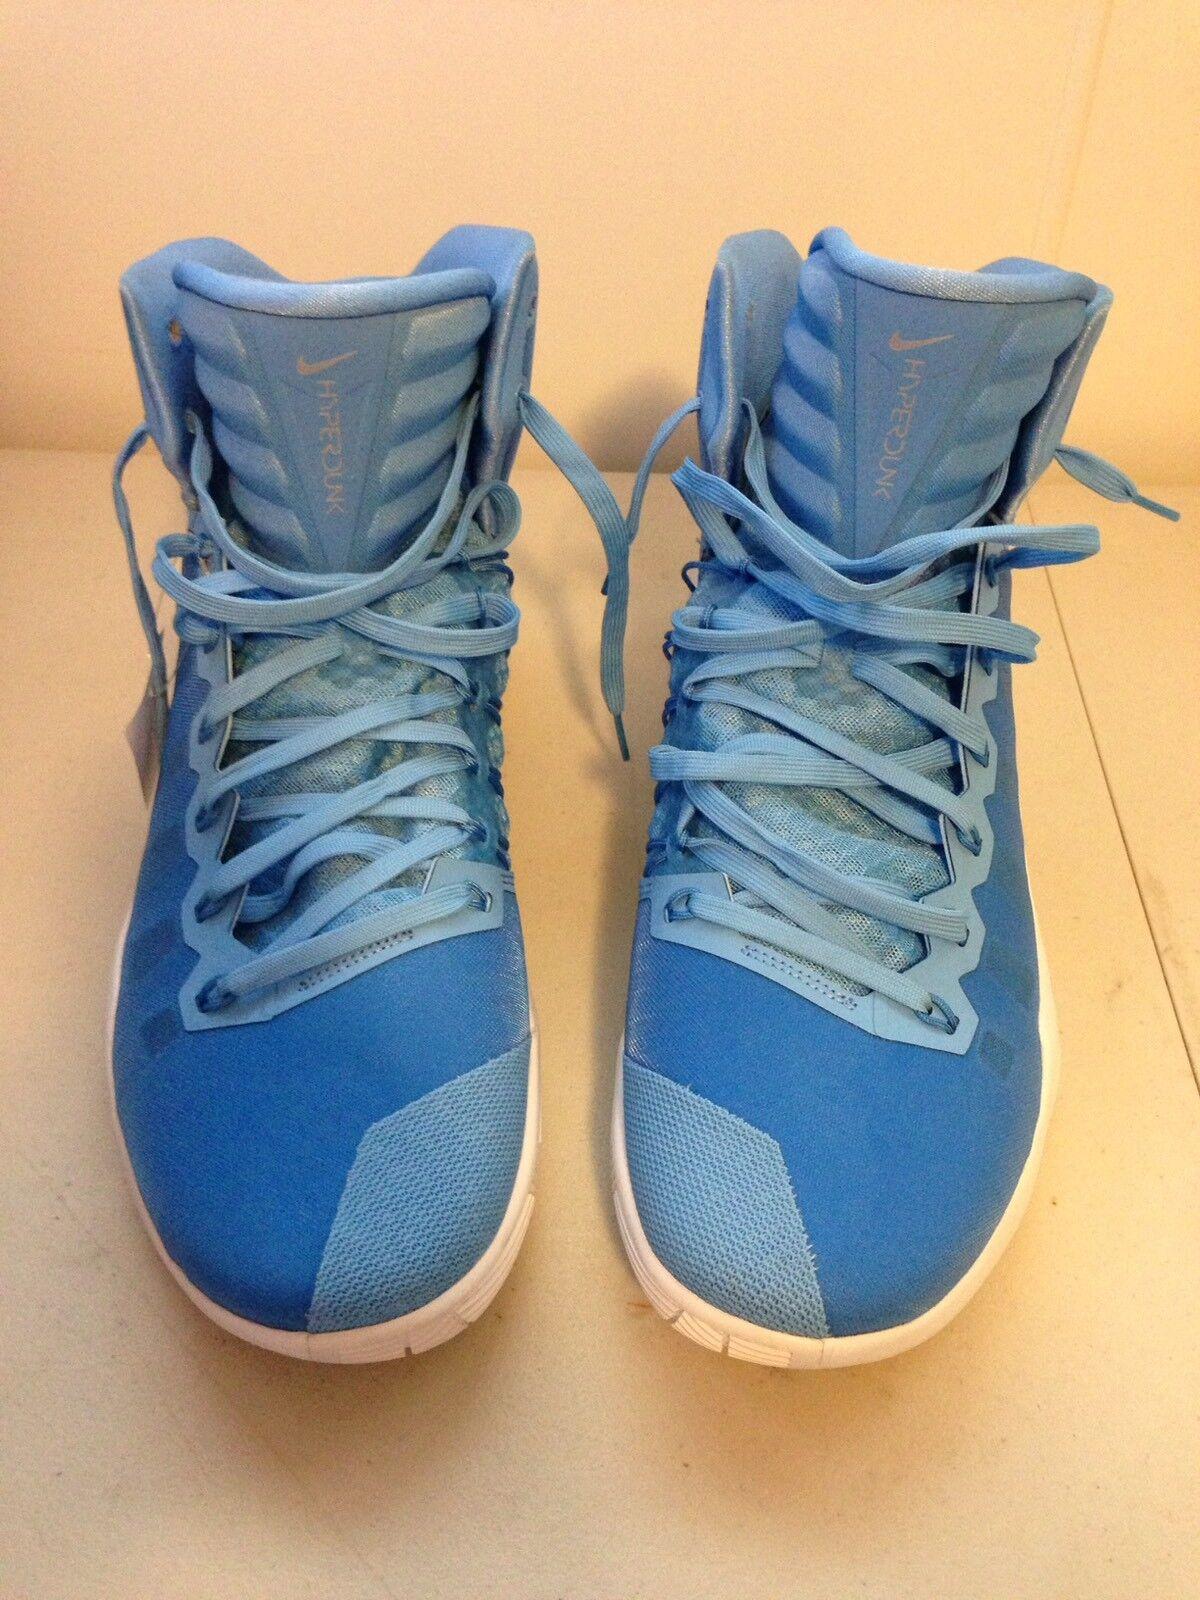 Men's NIKE Zoom Hyperdunk Athletic Sneakers, SZ18, Blue/White, 844368-443, 2018